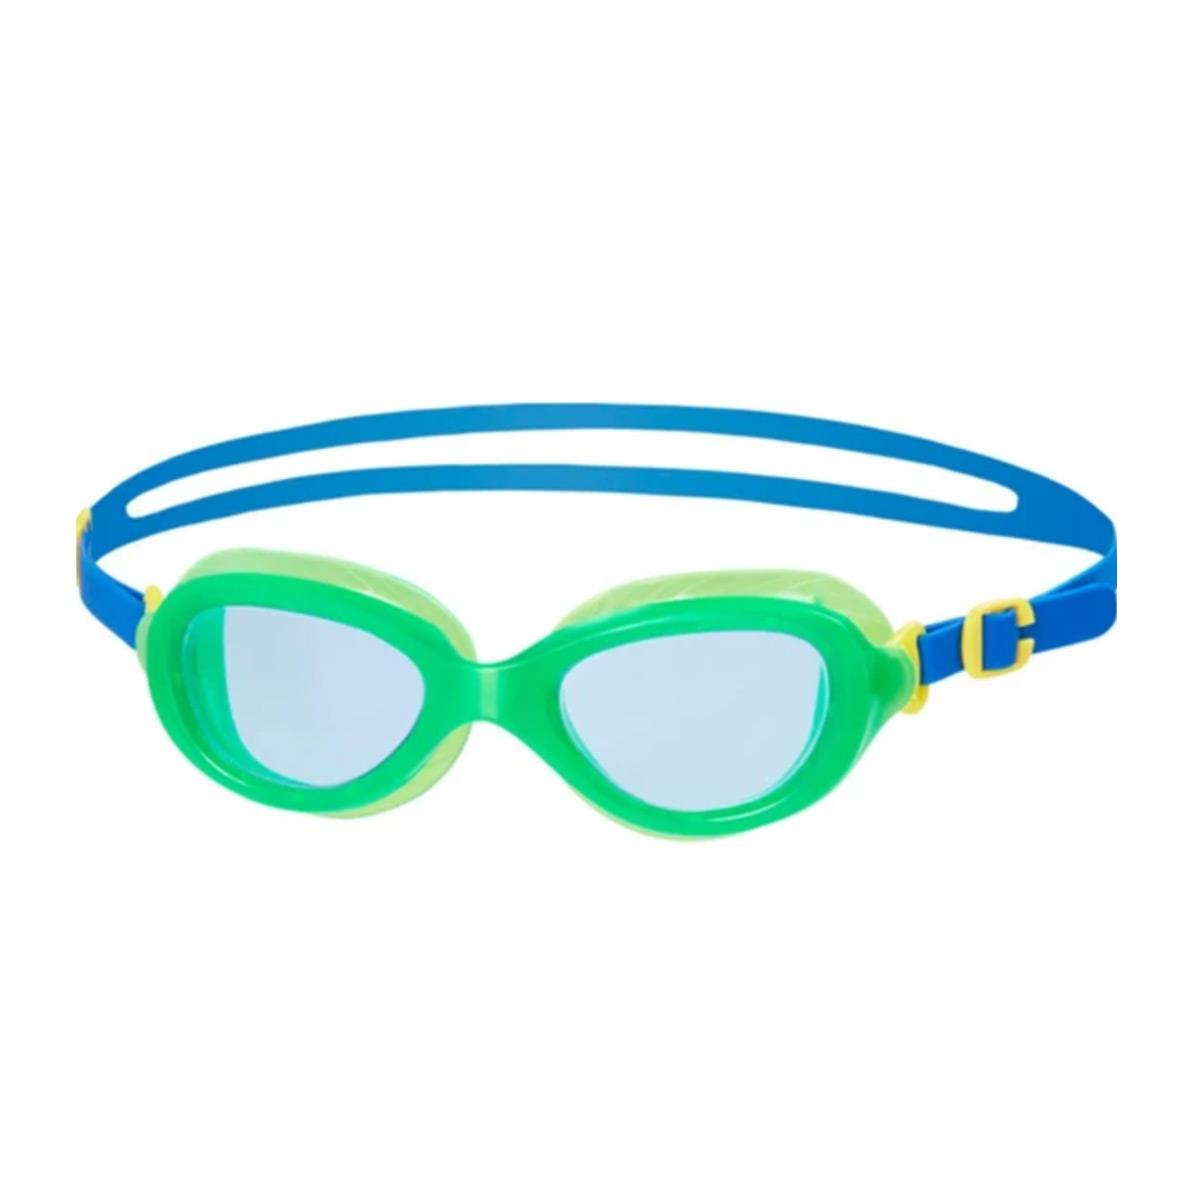 Speedo Futura Classıc JU GREEN/BLUE Çocuk Gözlük